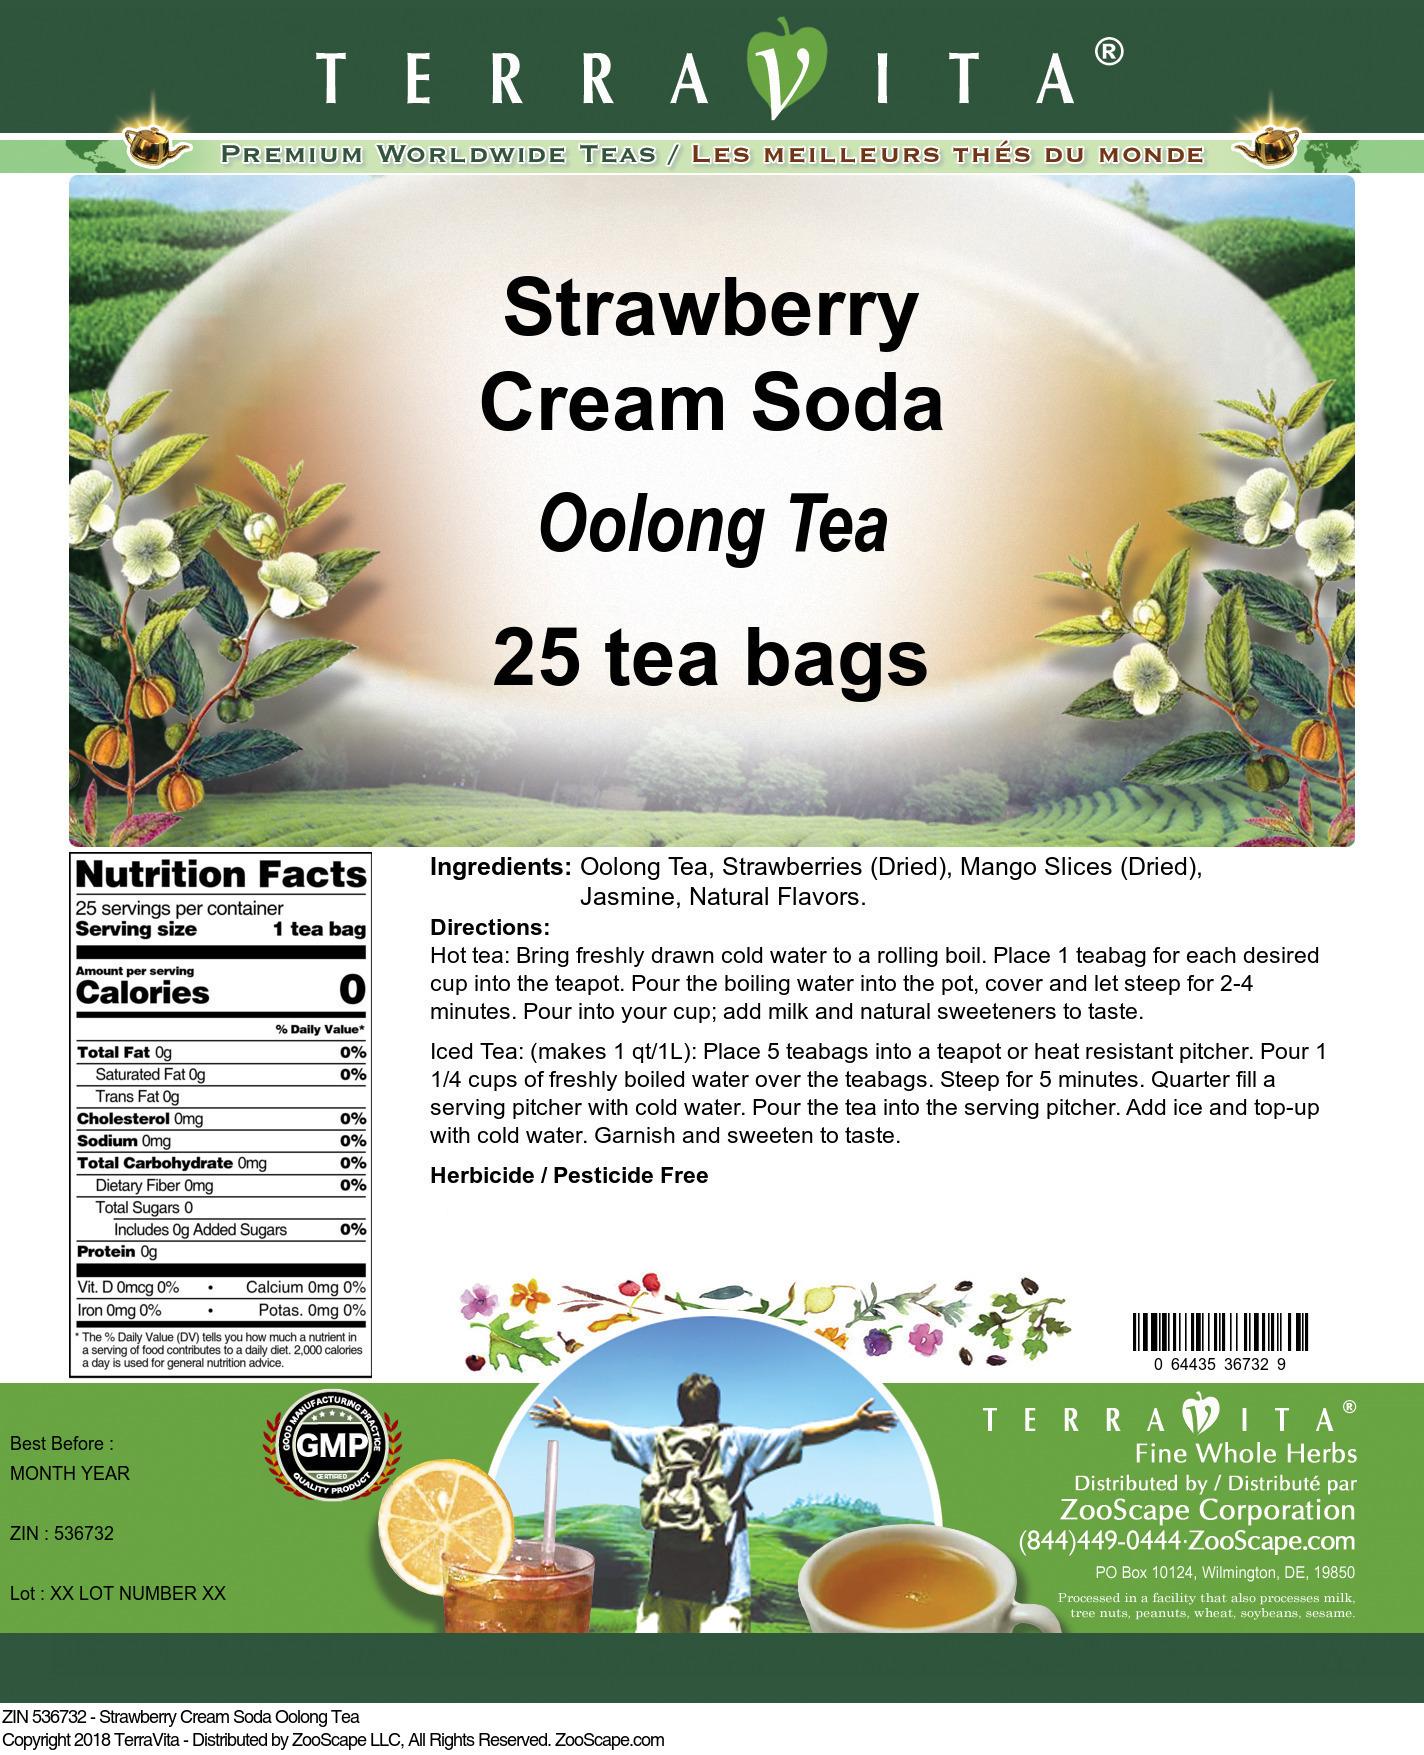 Strawberry Cream Soda Oolong Tea